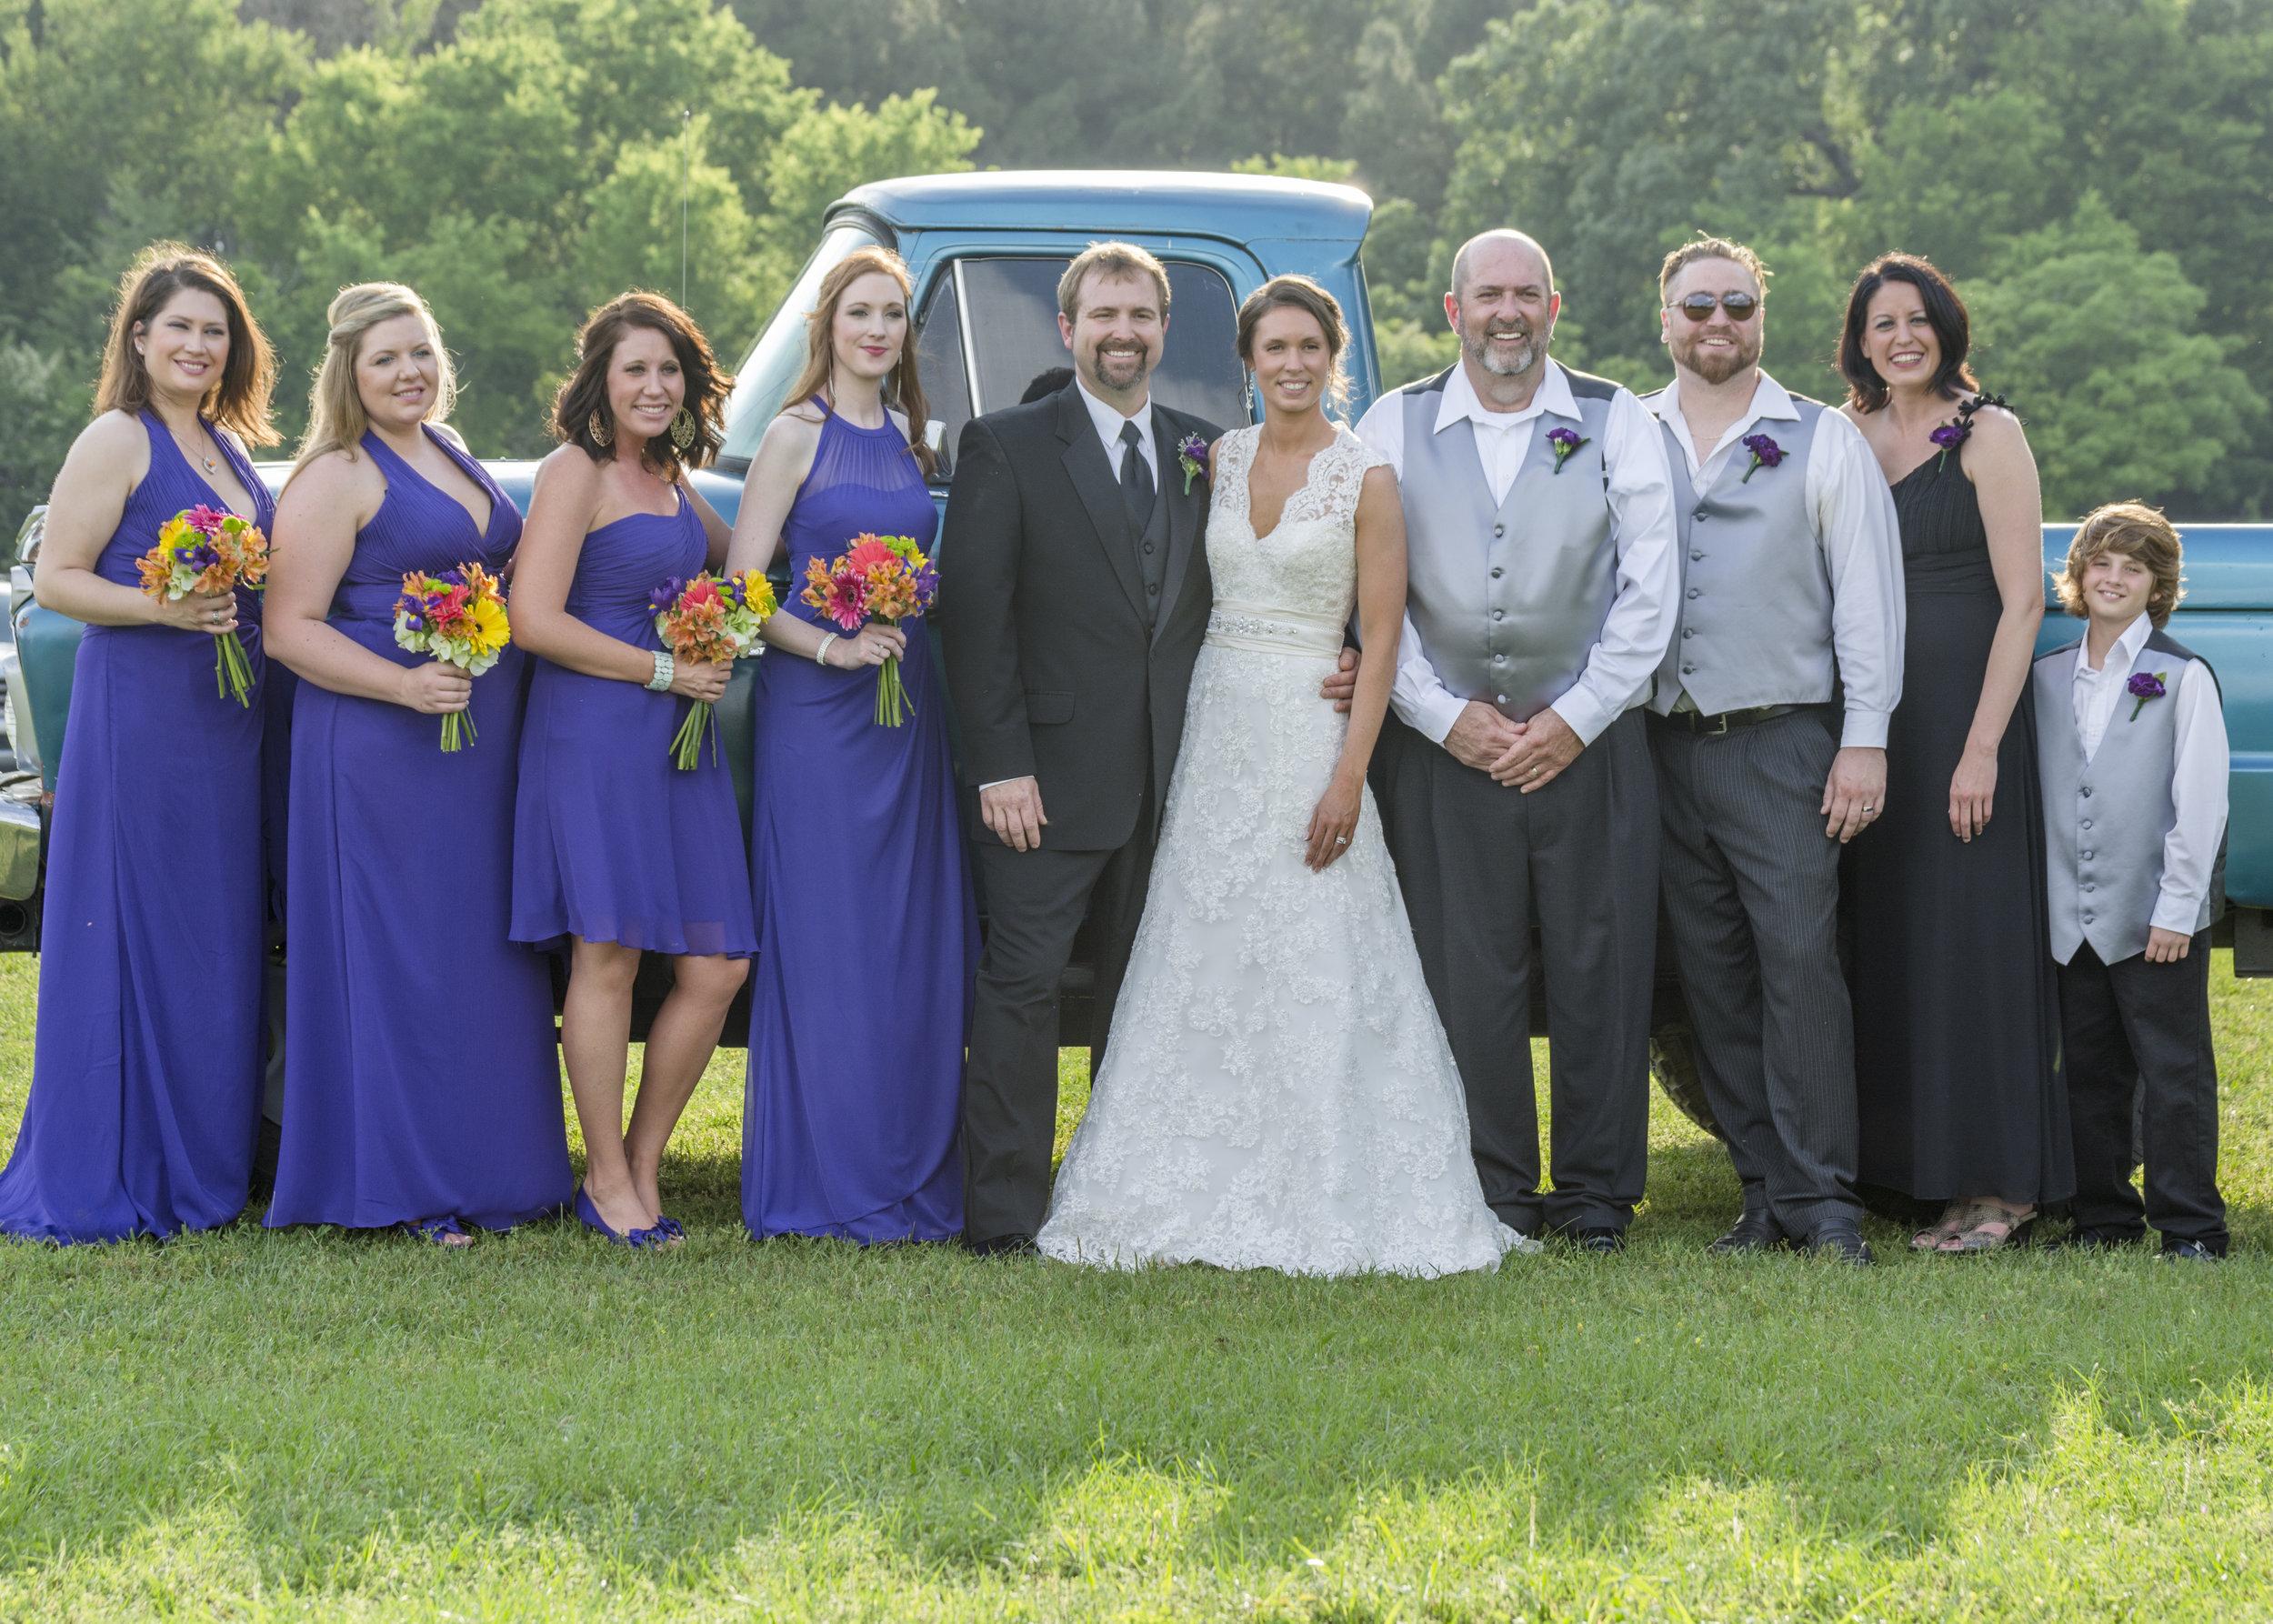 2015_05_16-Lum_Wedding__WSH7487__2015_Echo_Arkansas.jpg